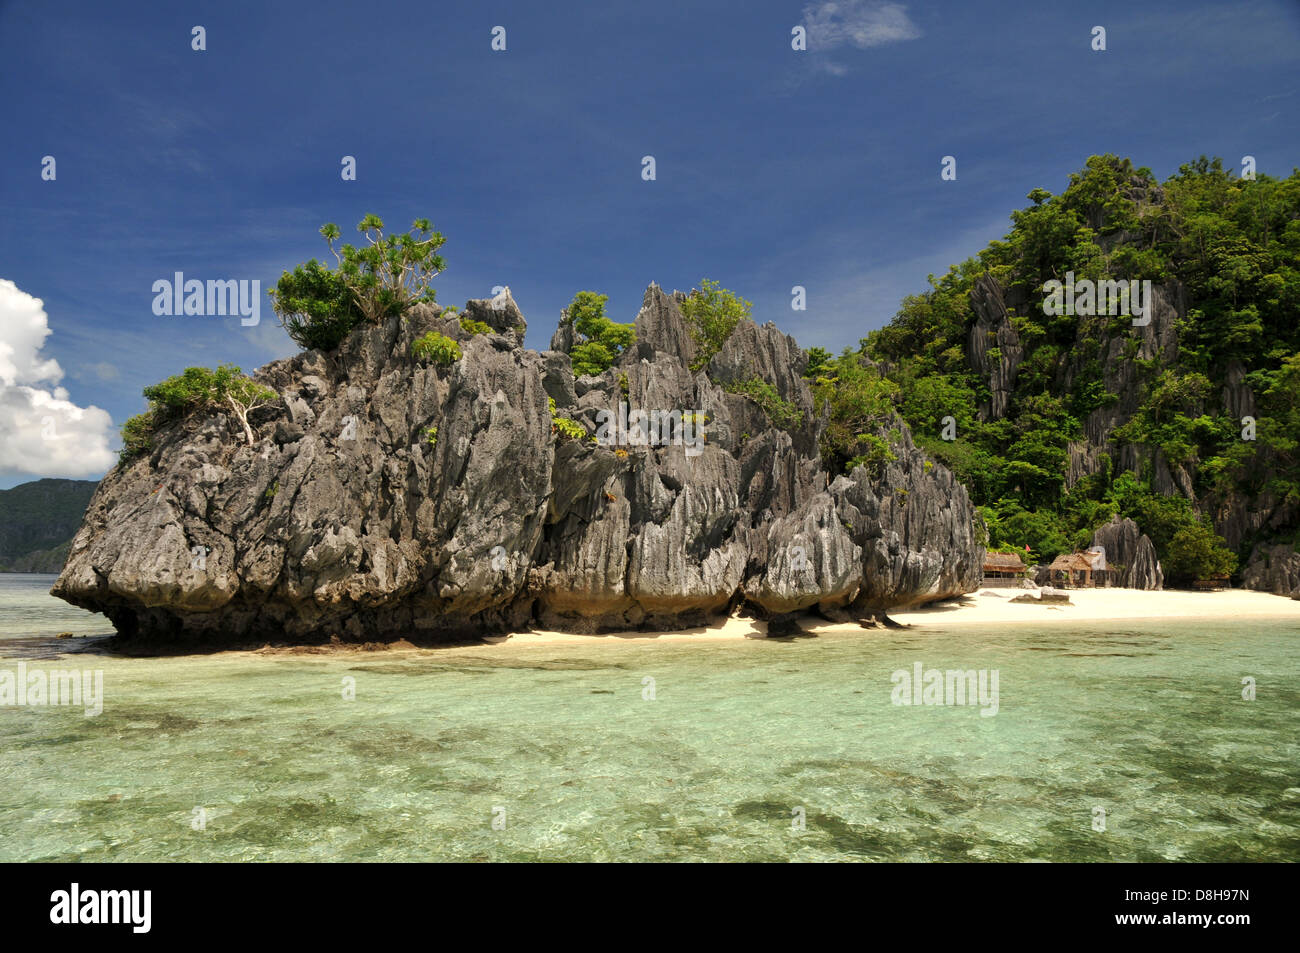 dream vacation - Stock Image